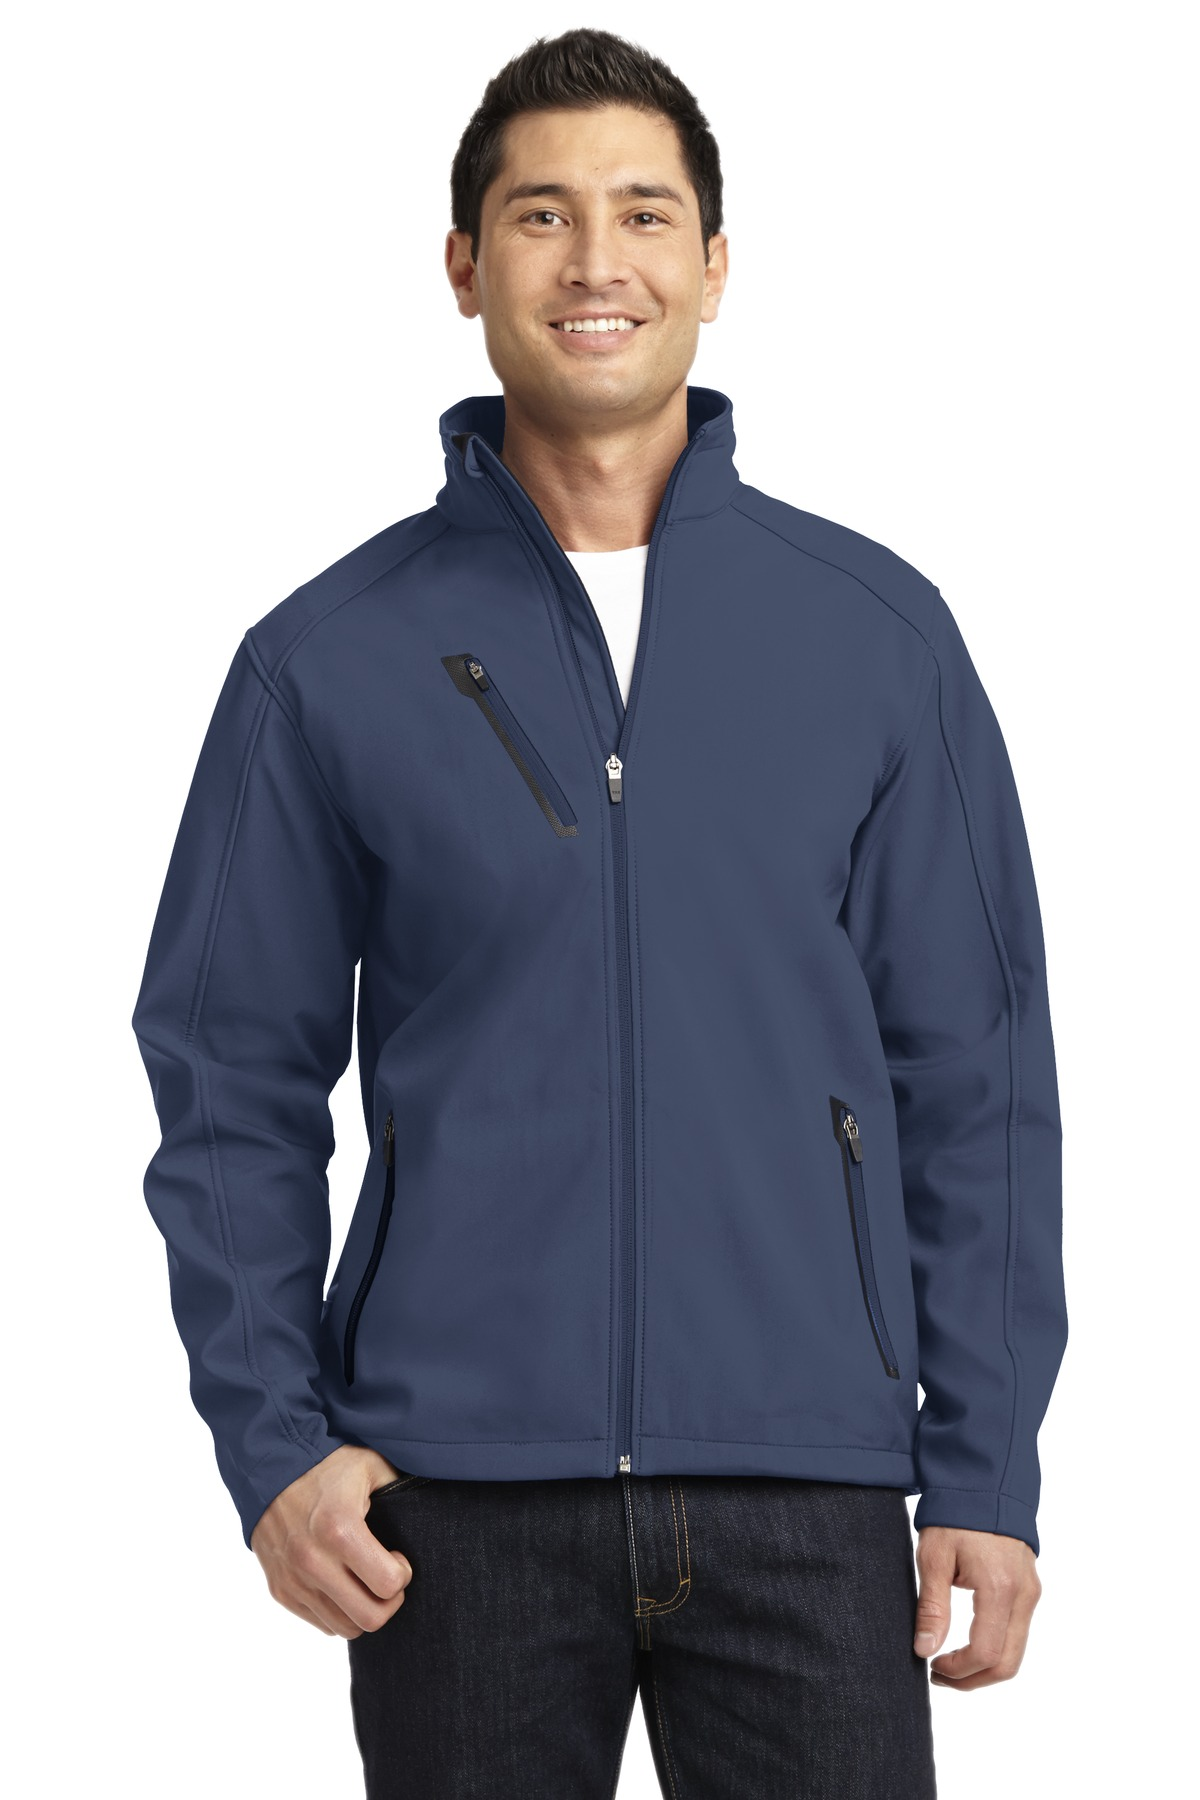 Port Authority Welded Soft Shell Jacket. J324